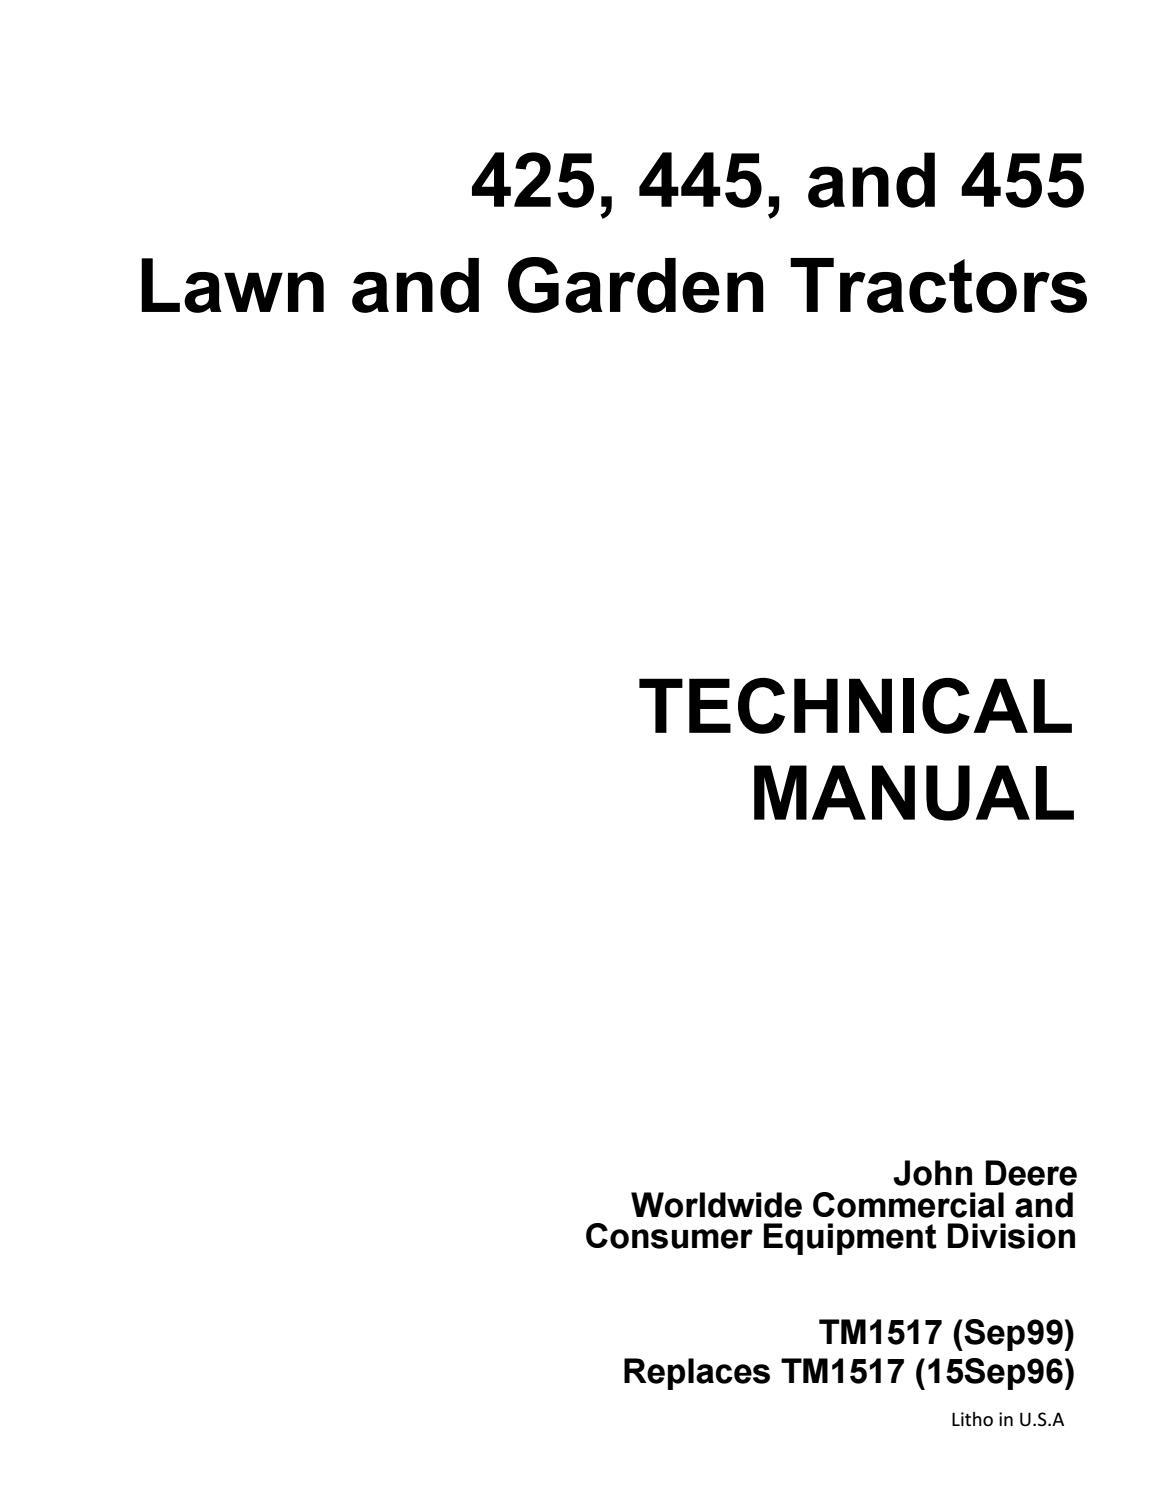 John deere 445 lawn garden tractor service repair manual by kjsmfmmf - issuuIssuu